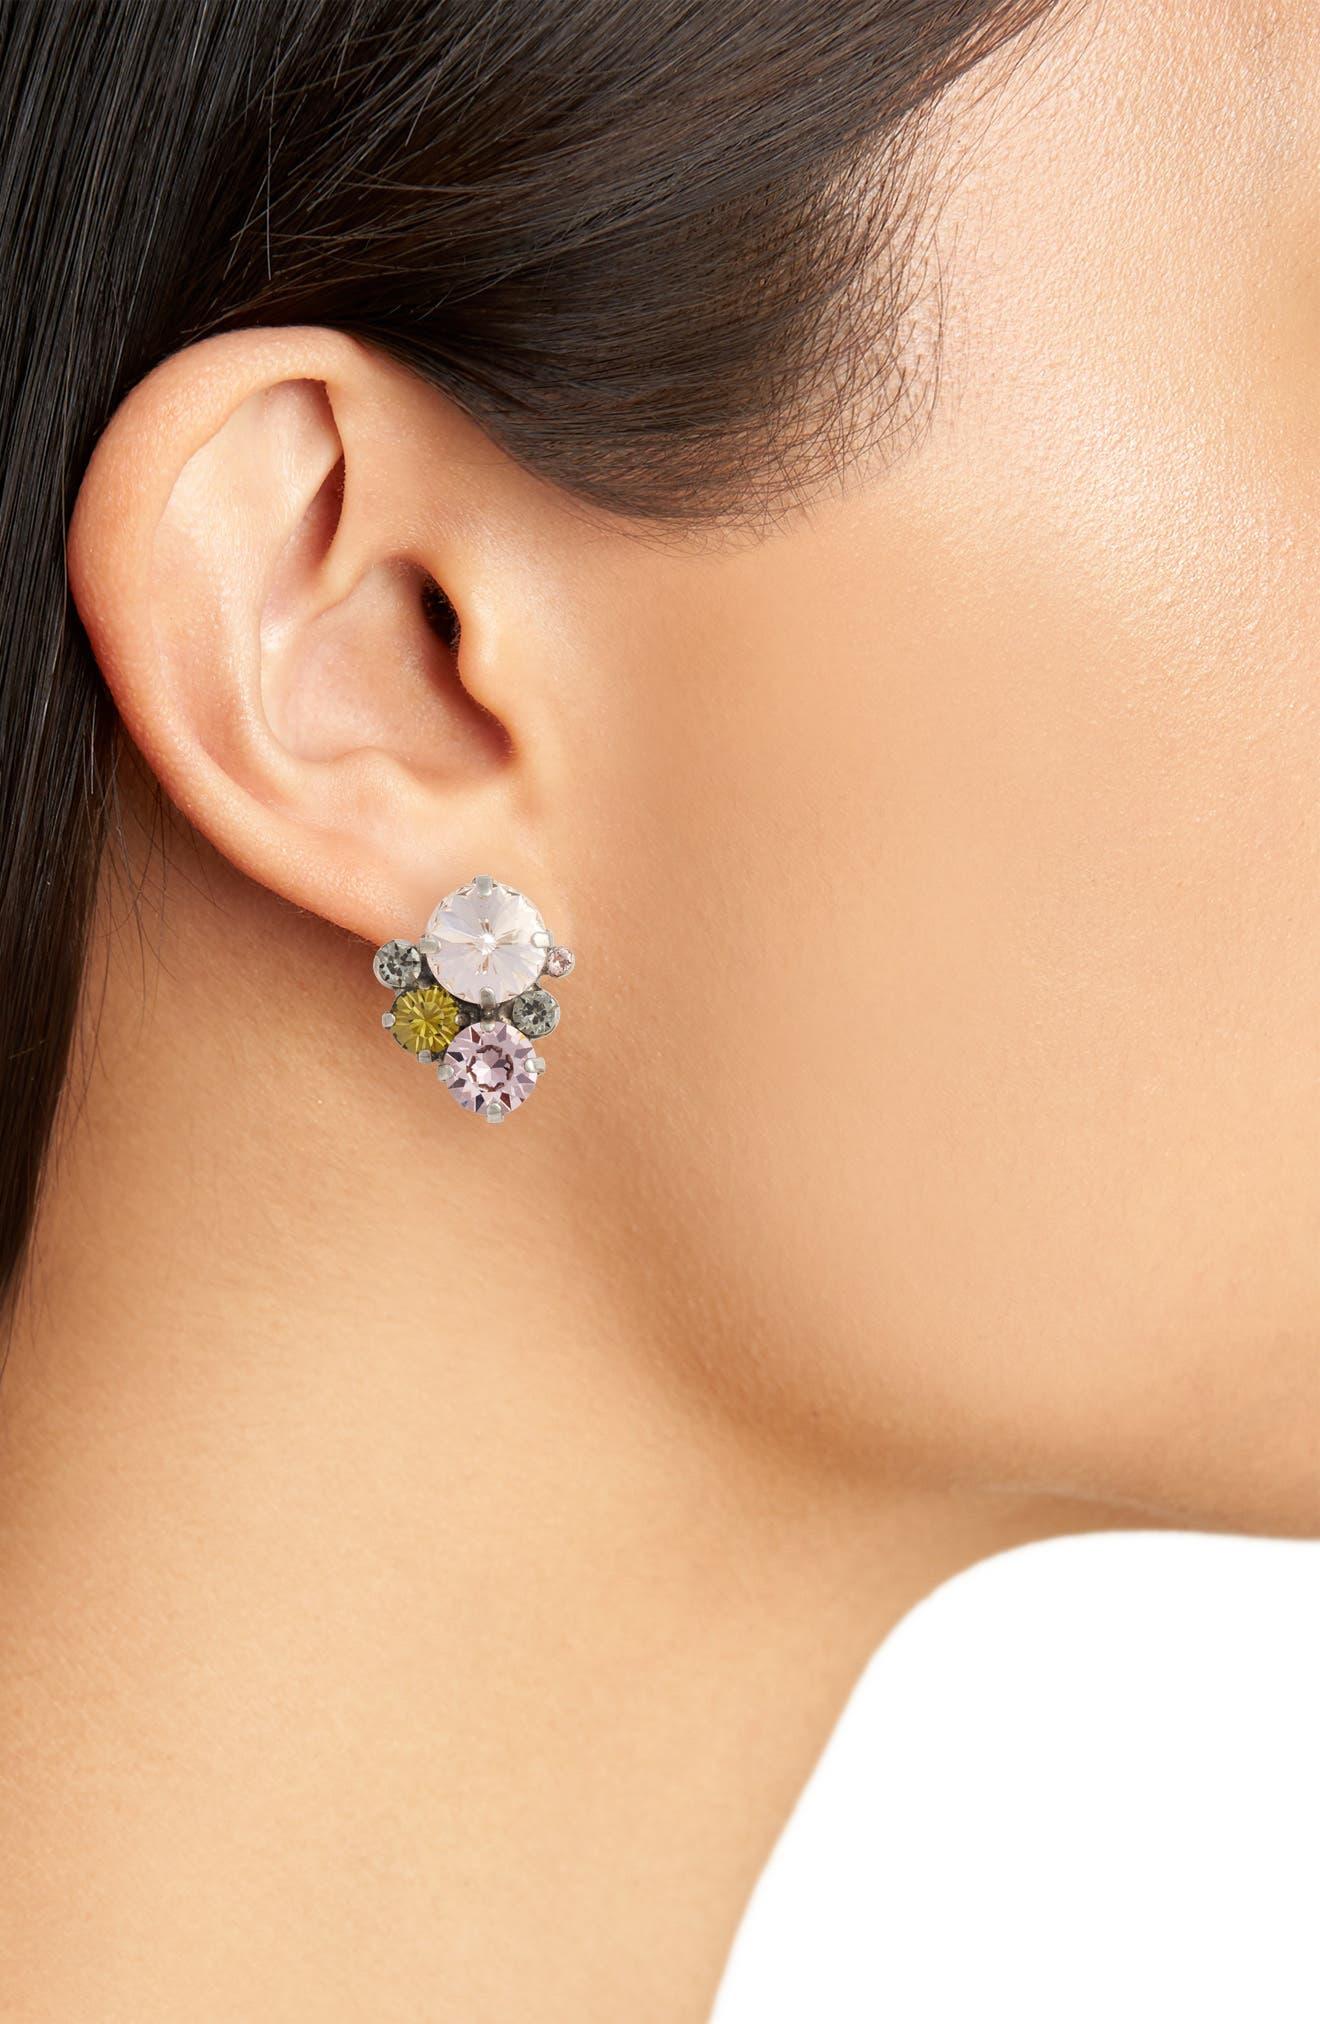 Army Girl Crystal Stud Earrings,                             Alternate thumbnail 2, color,                             Pink